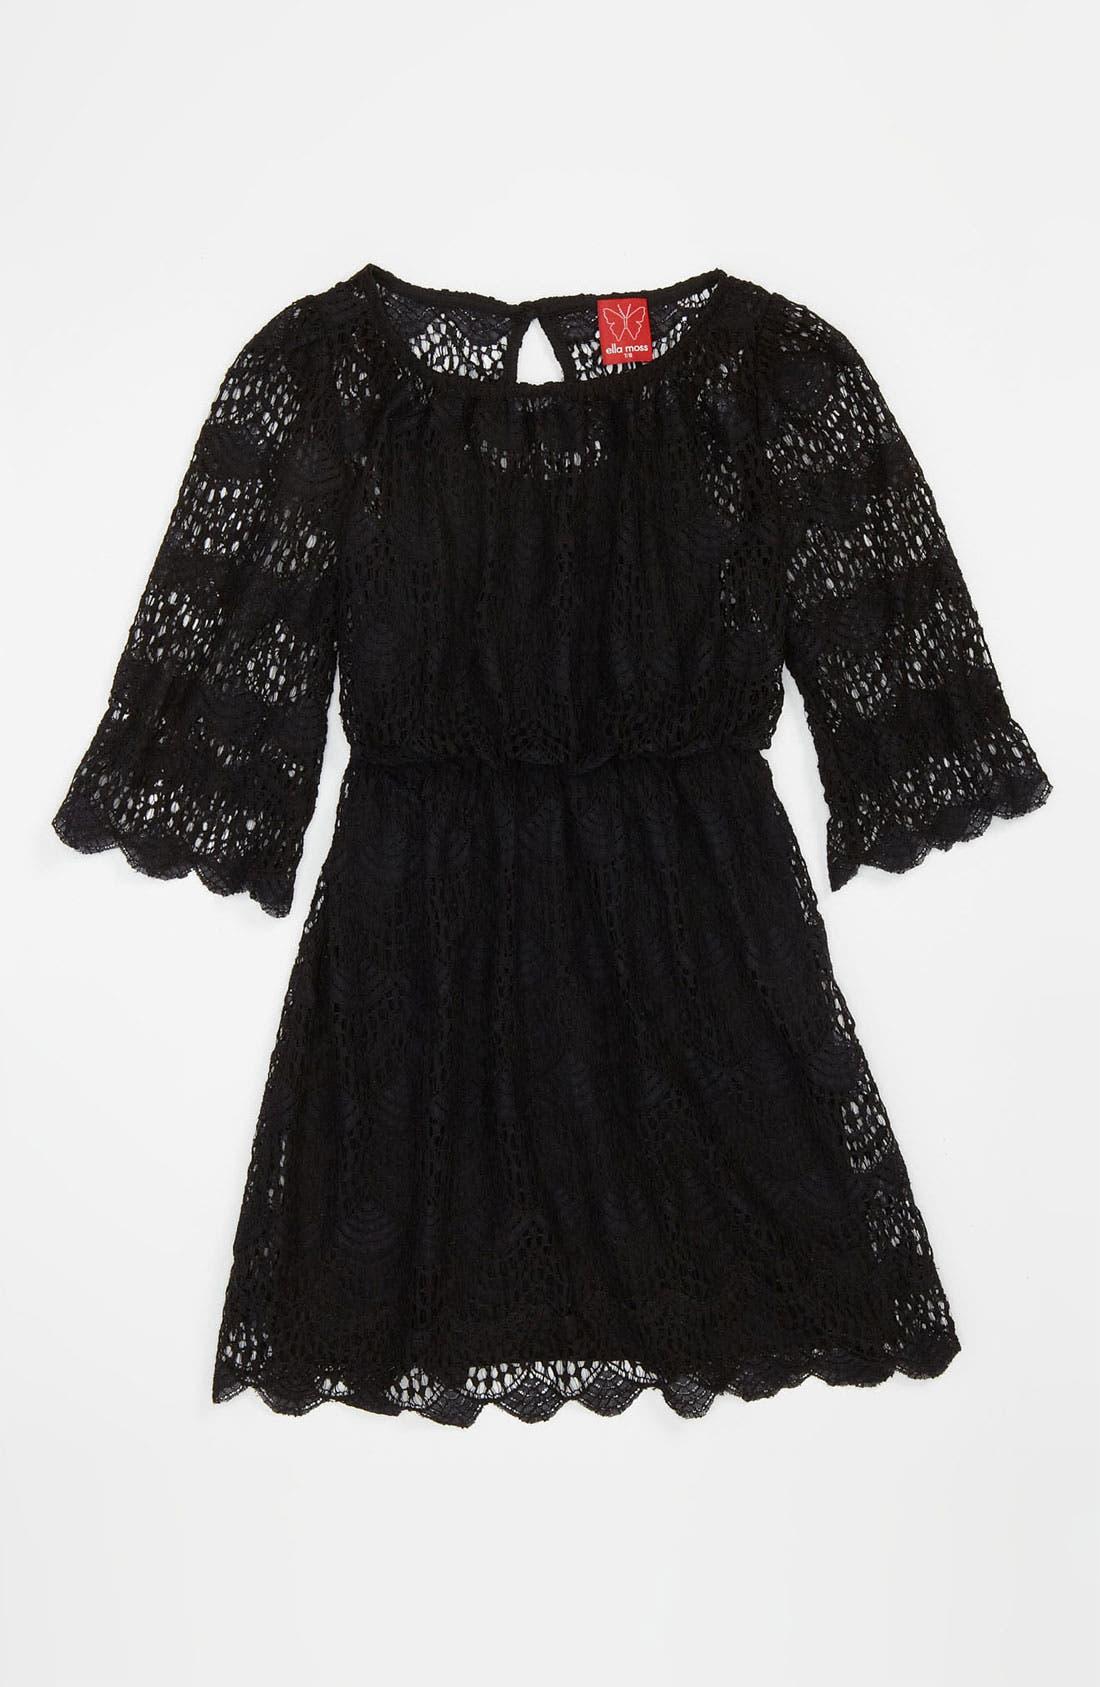 Alternate Image 1 Selected - Ella Moss 'Ivy' Lace Dress (Big Girls)